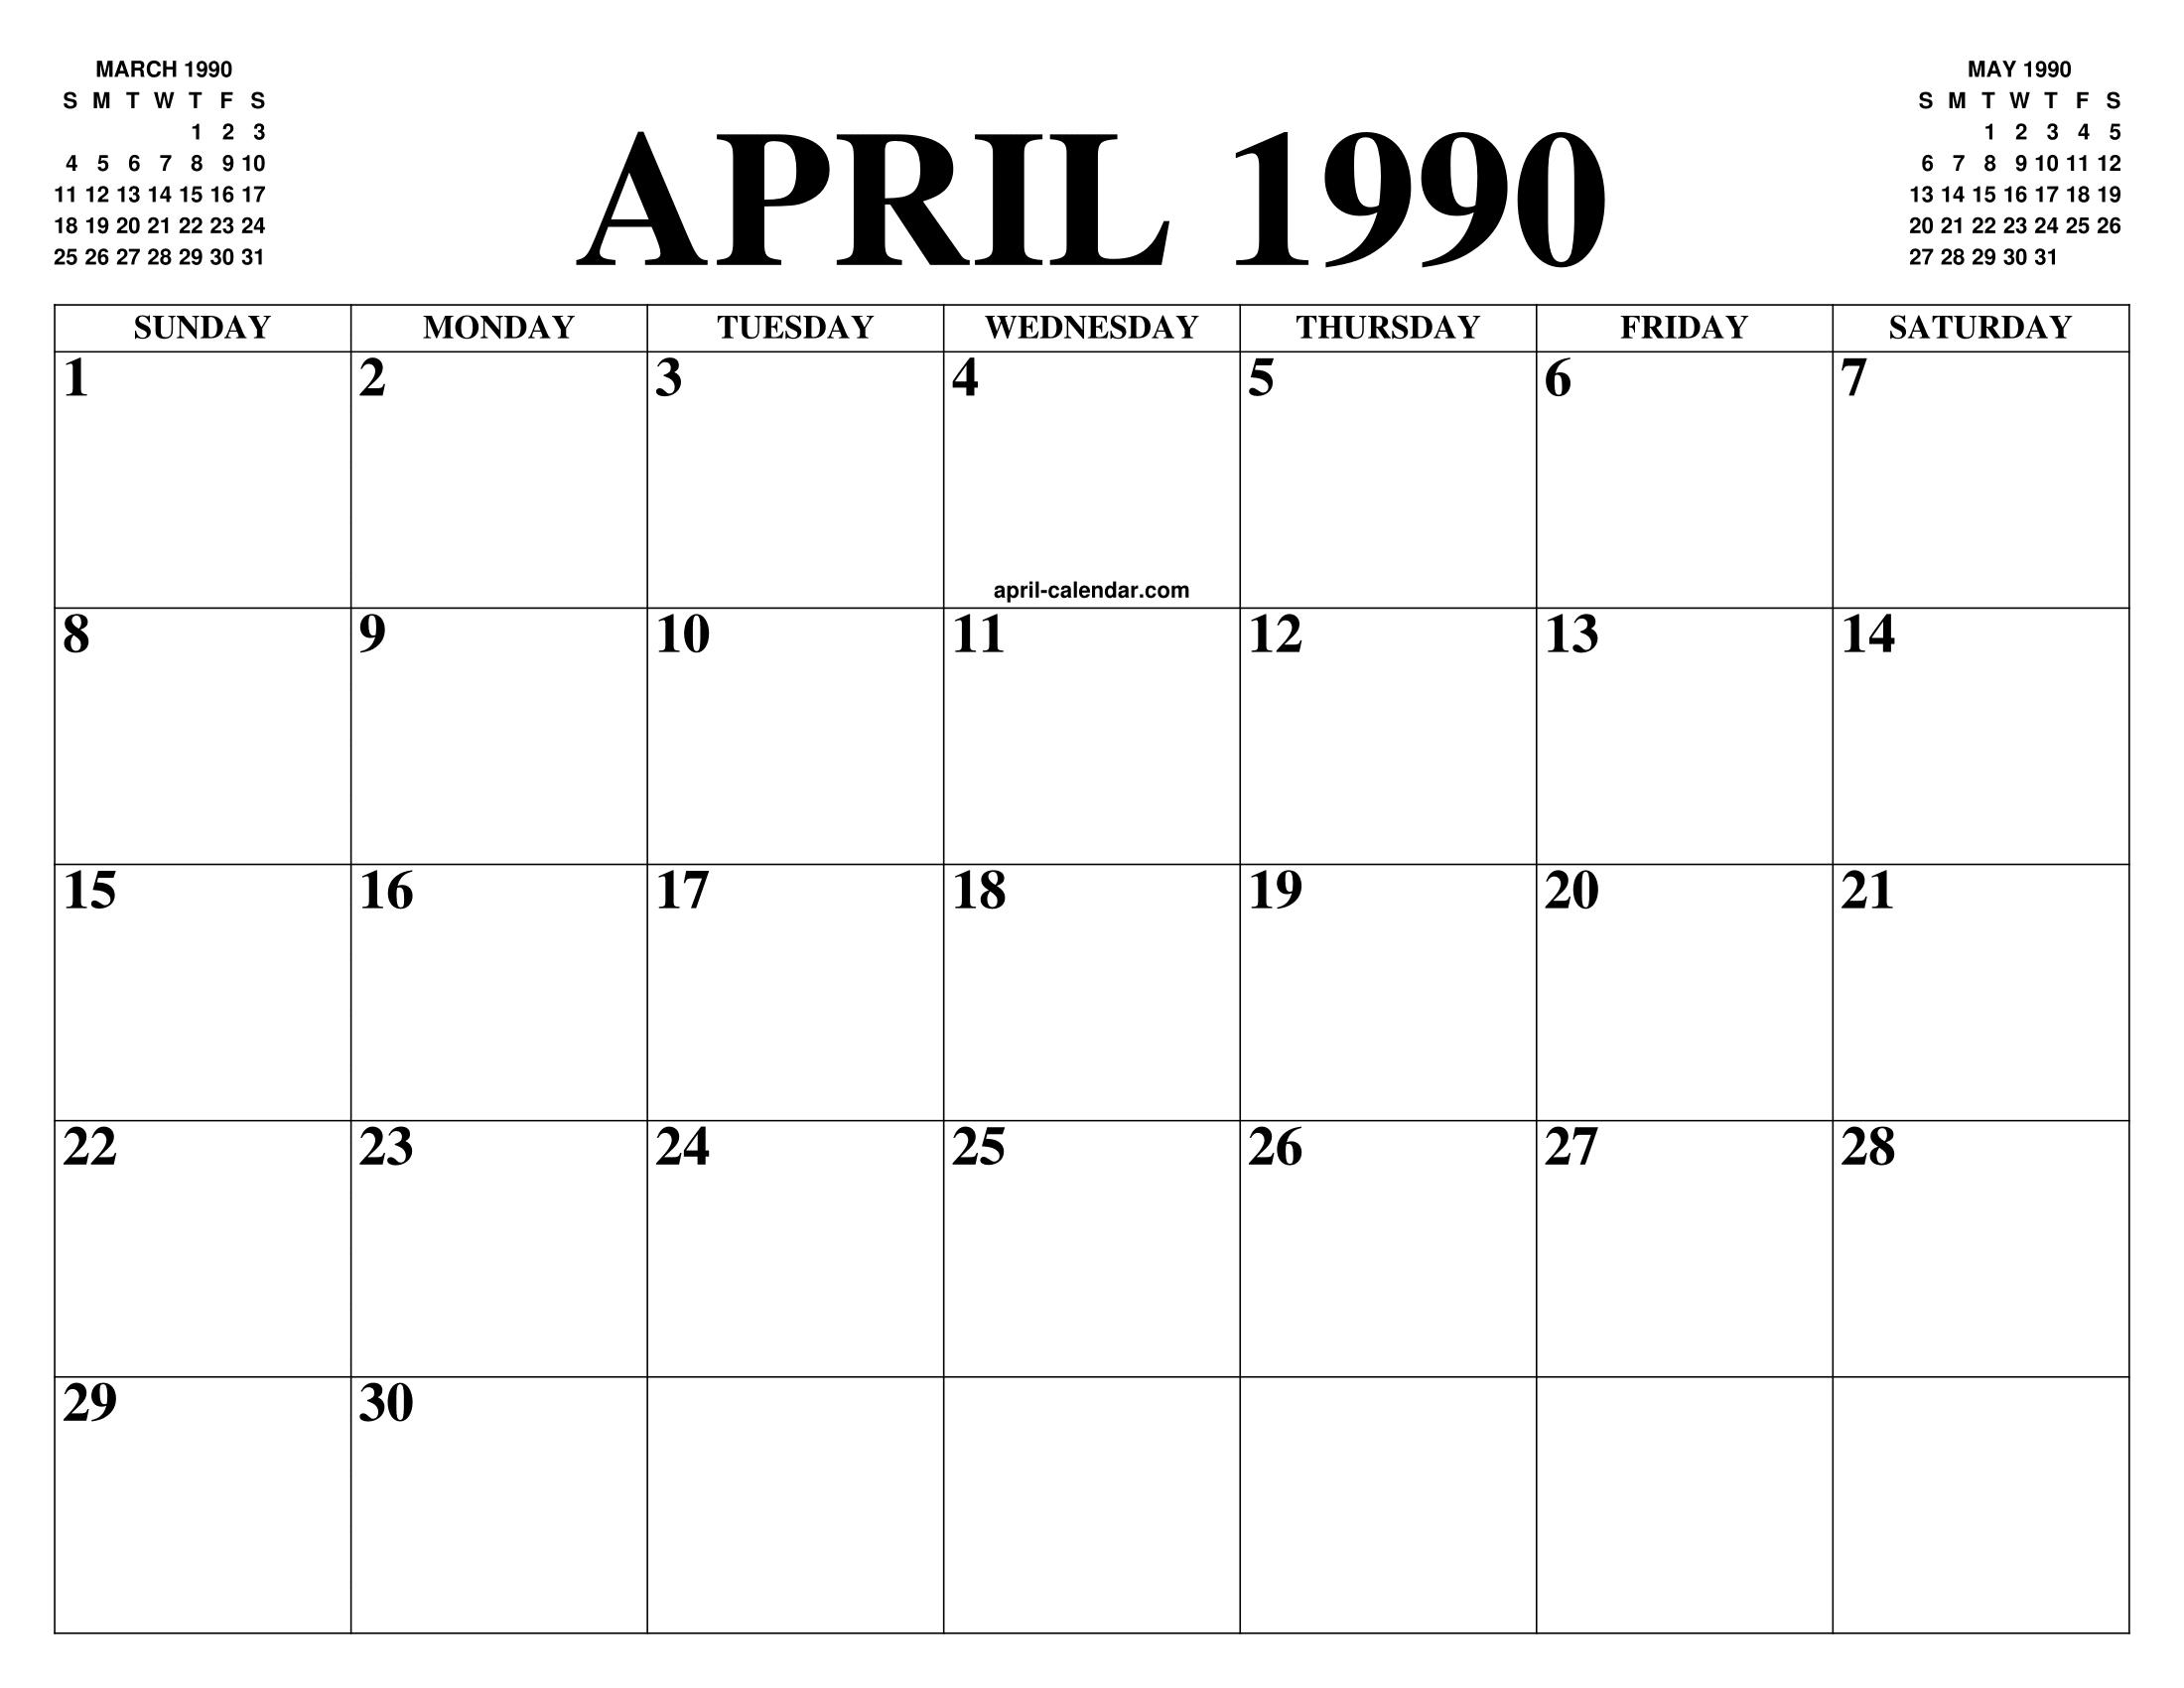 1990 Calendario.April 1990 Calendar Of The Month Free Printable April